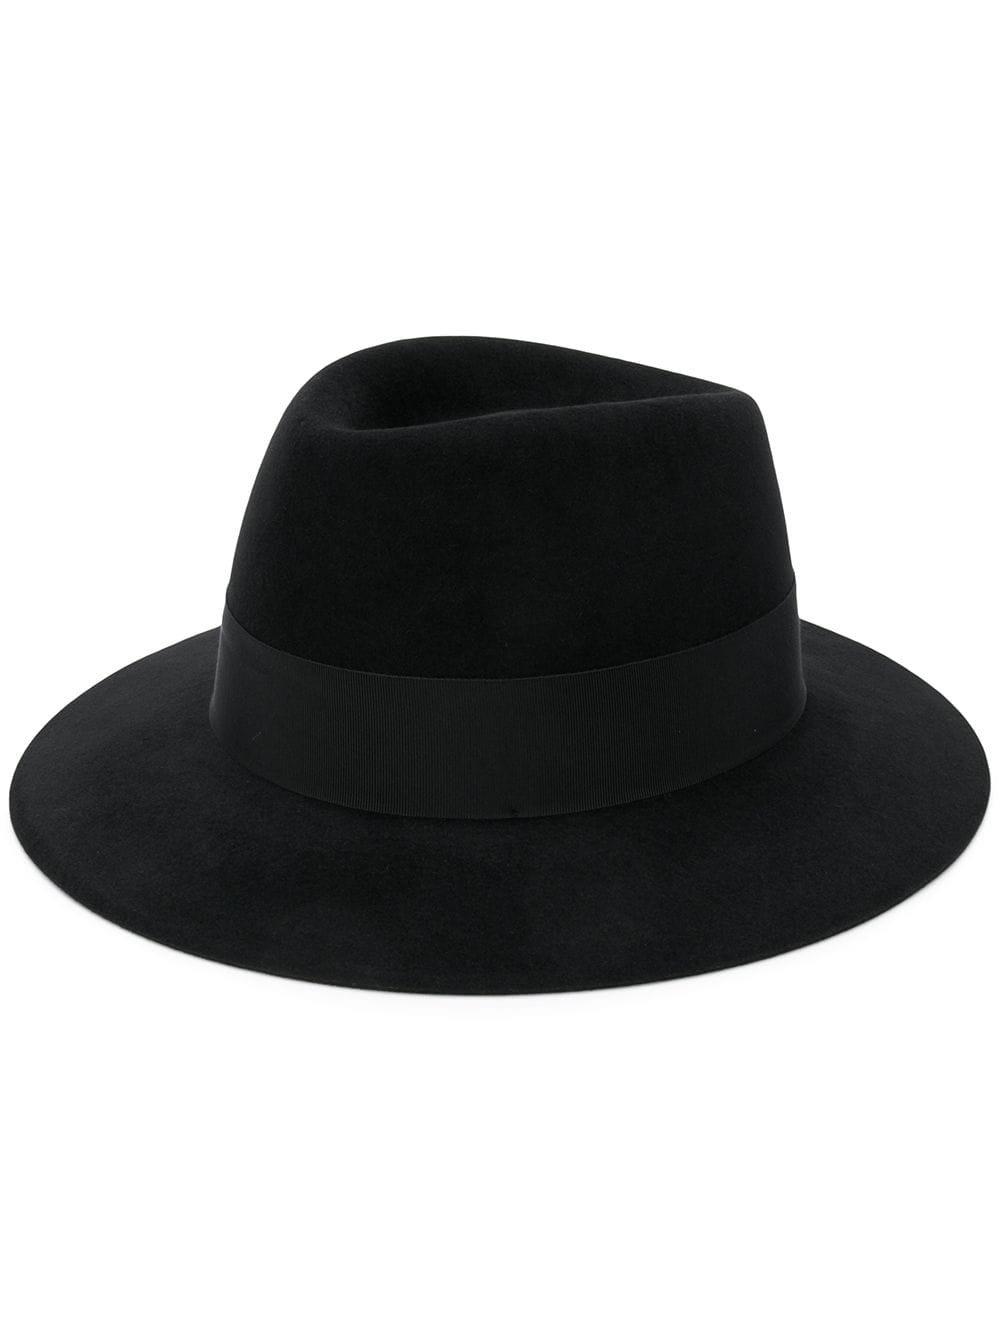 Saint Laurent Wide Brim Fedora Hat | Farfetch.com